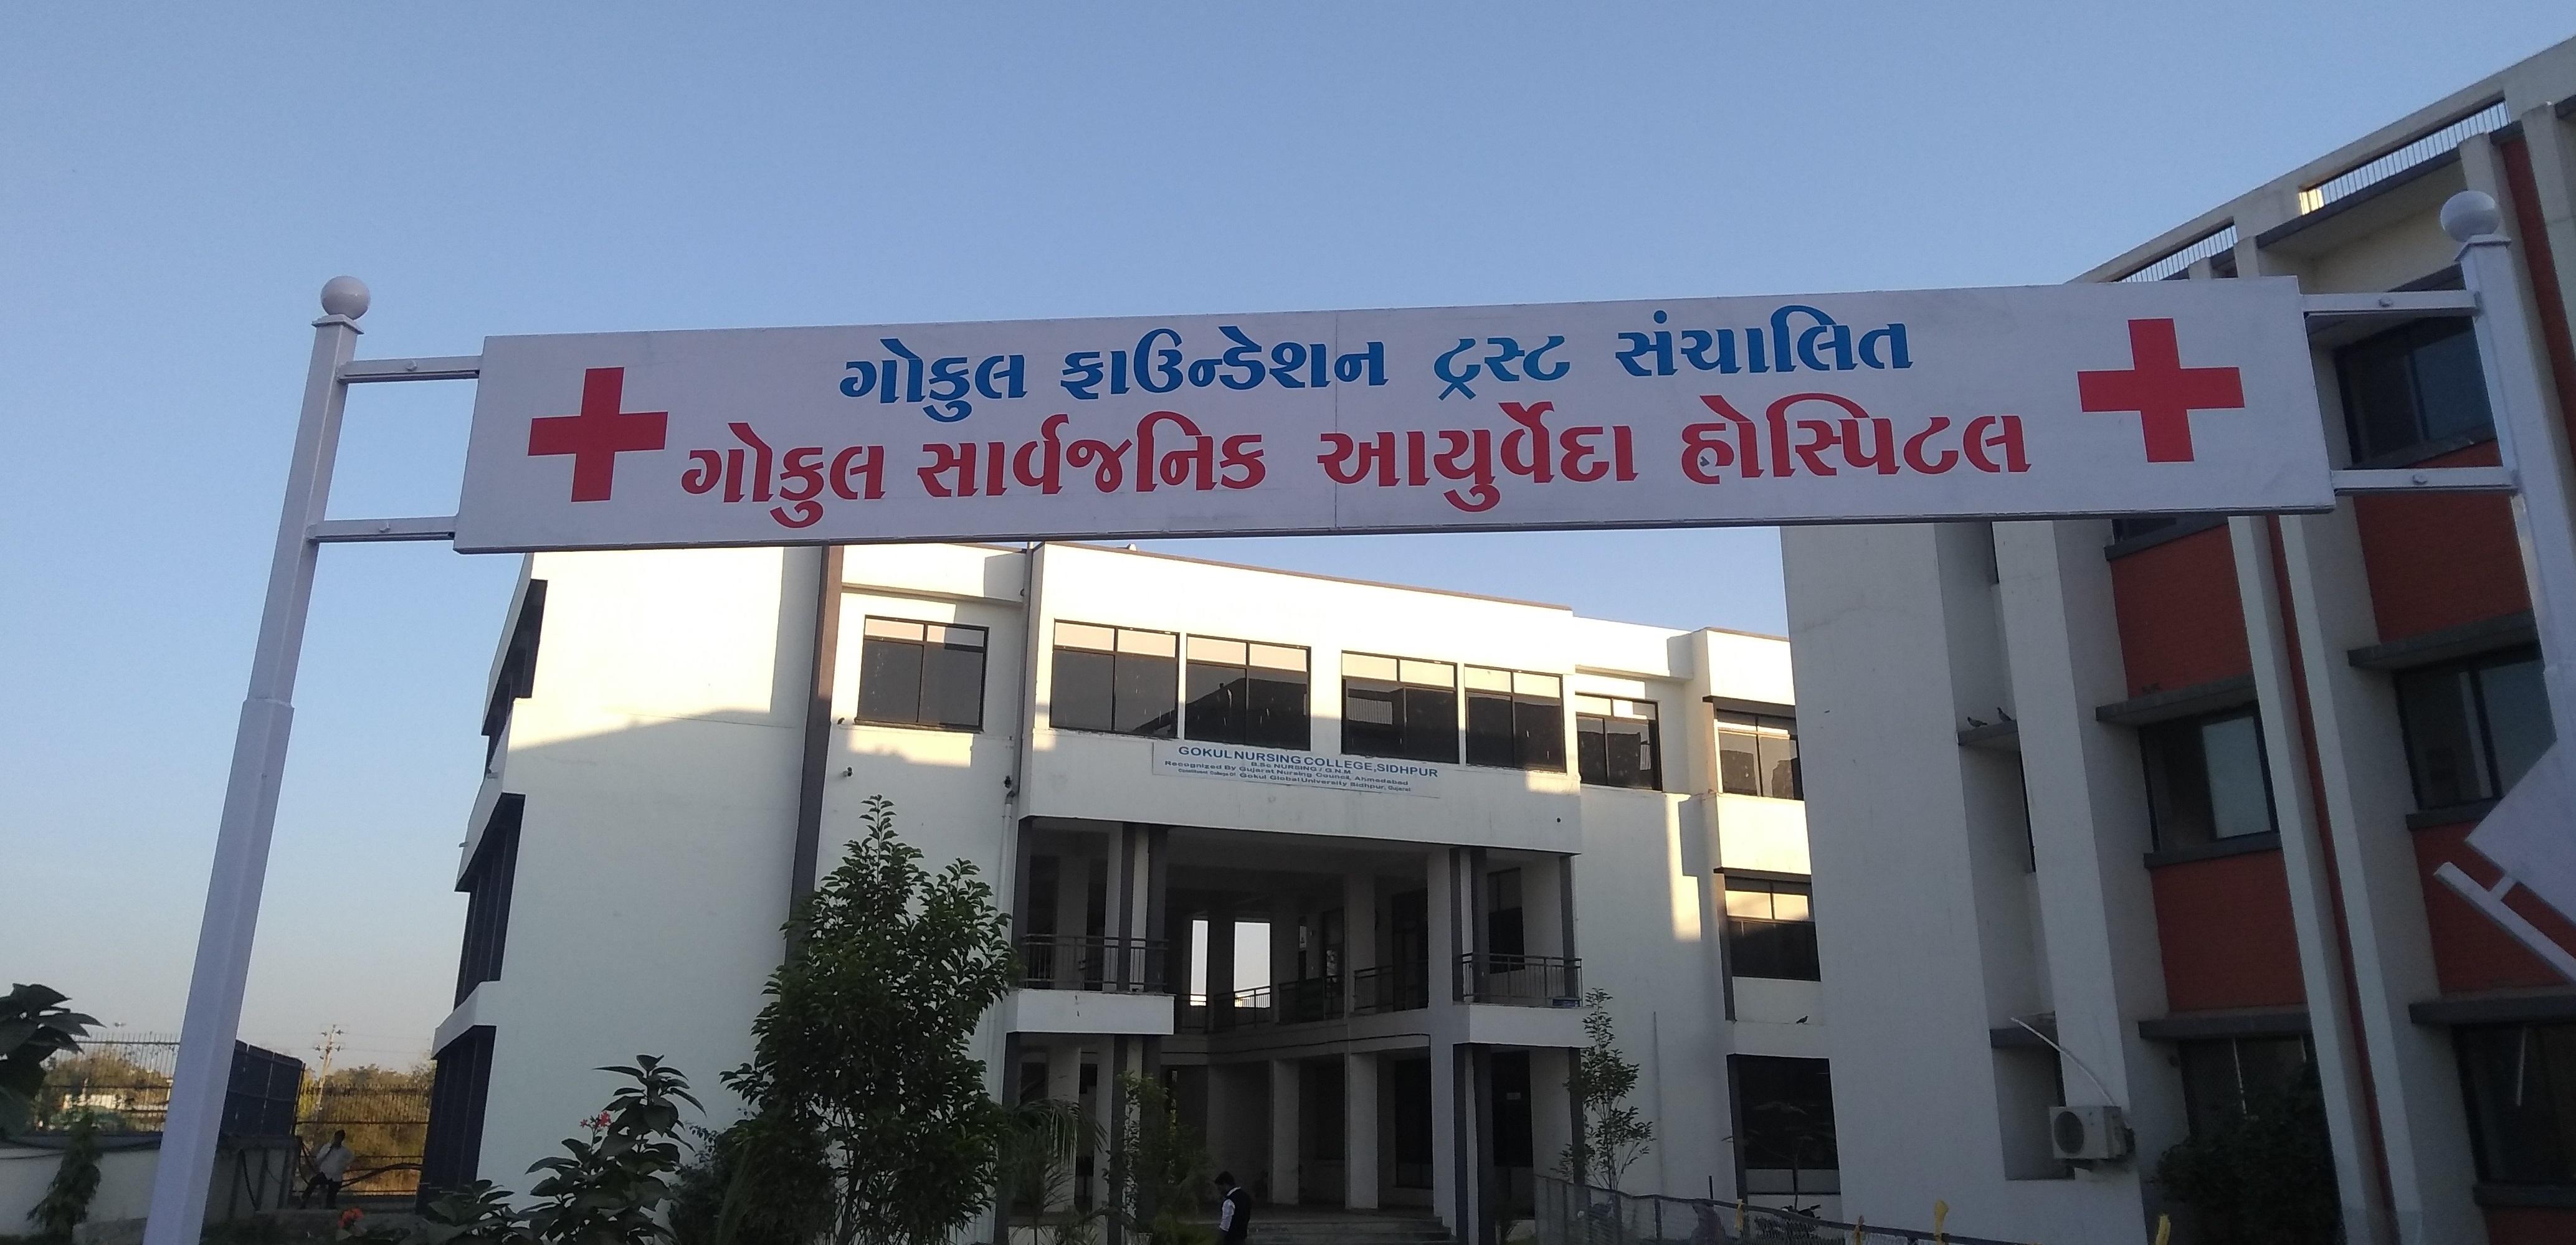 Gokul Ayurvedic College, Siddhapur